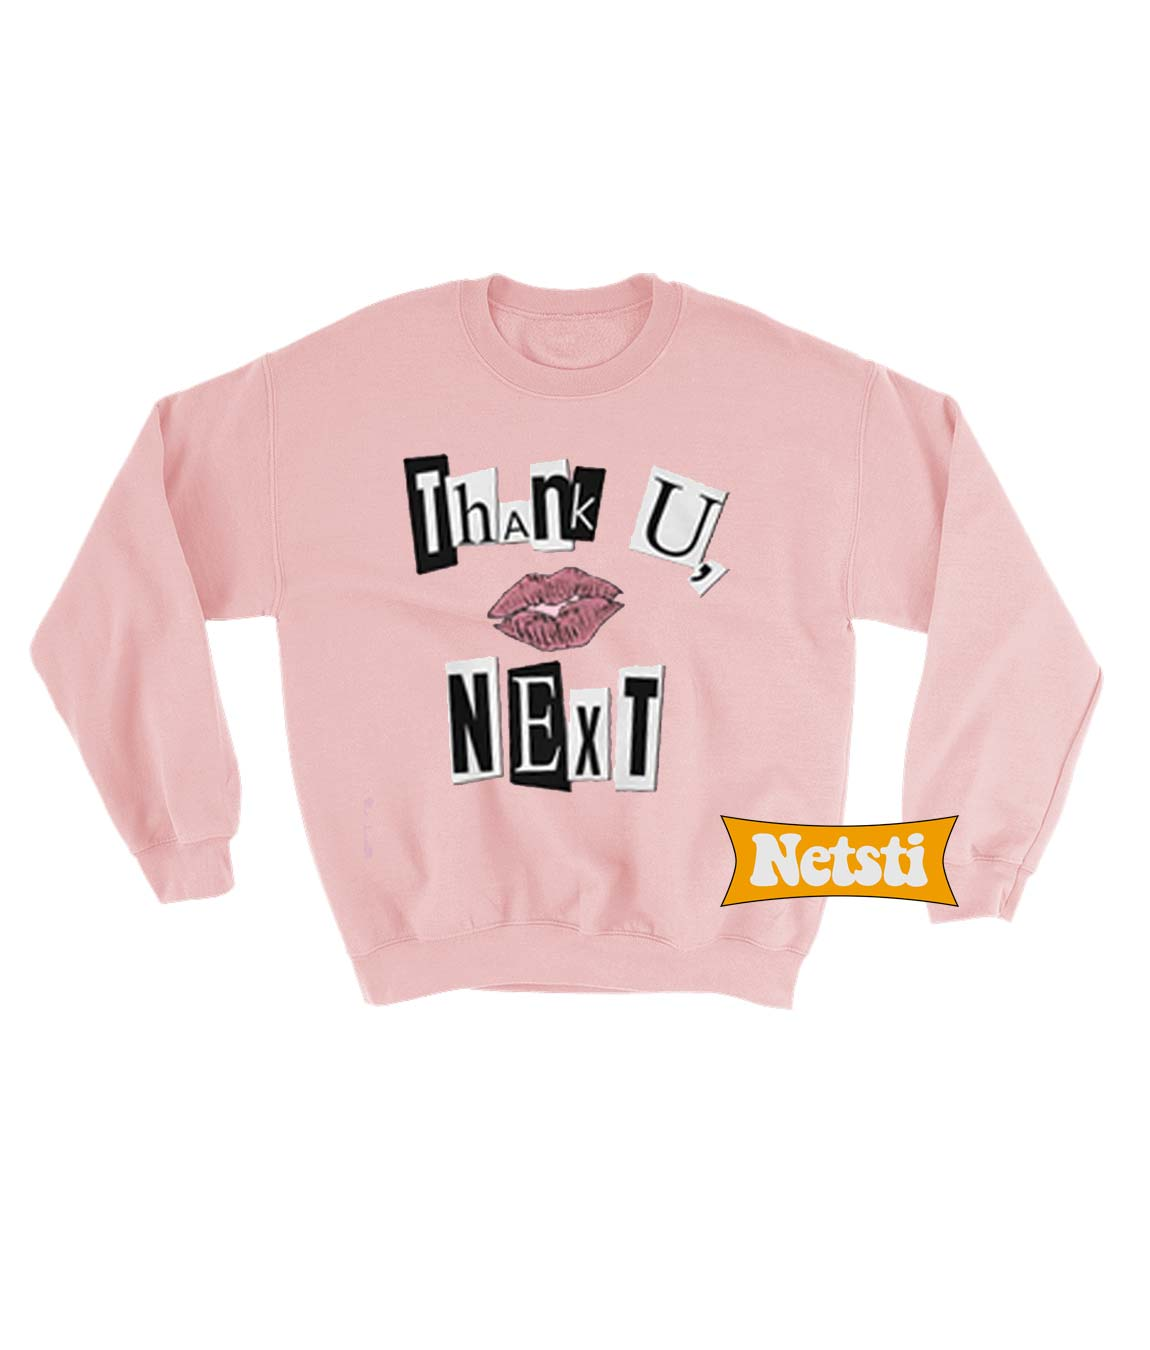 4b27daf2b Thank U Next Ariana Grande Chic Fashion Sweatshirt Unisex This Year